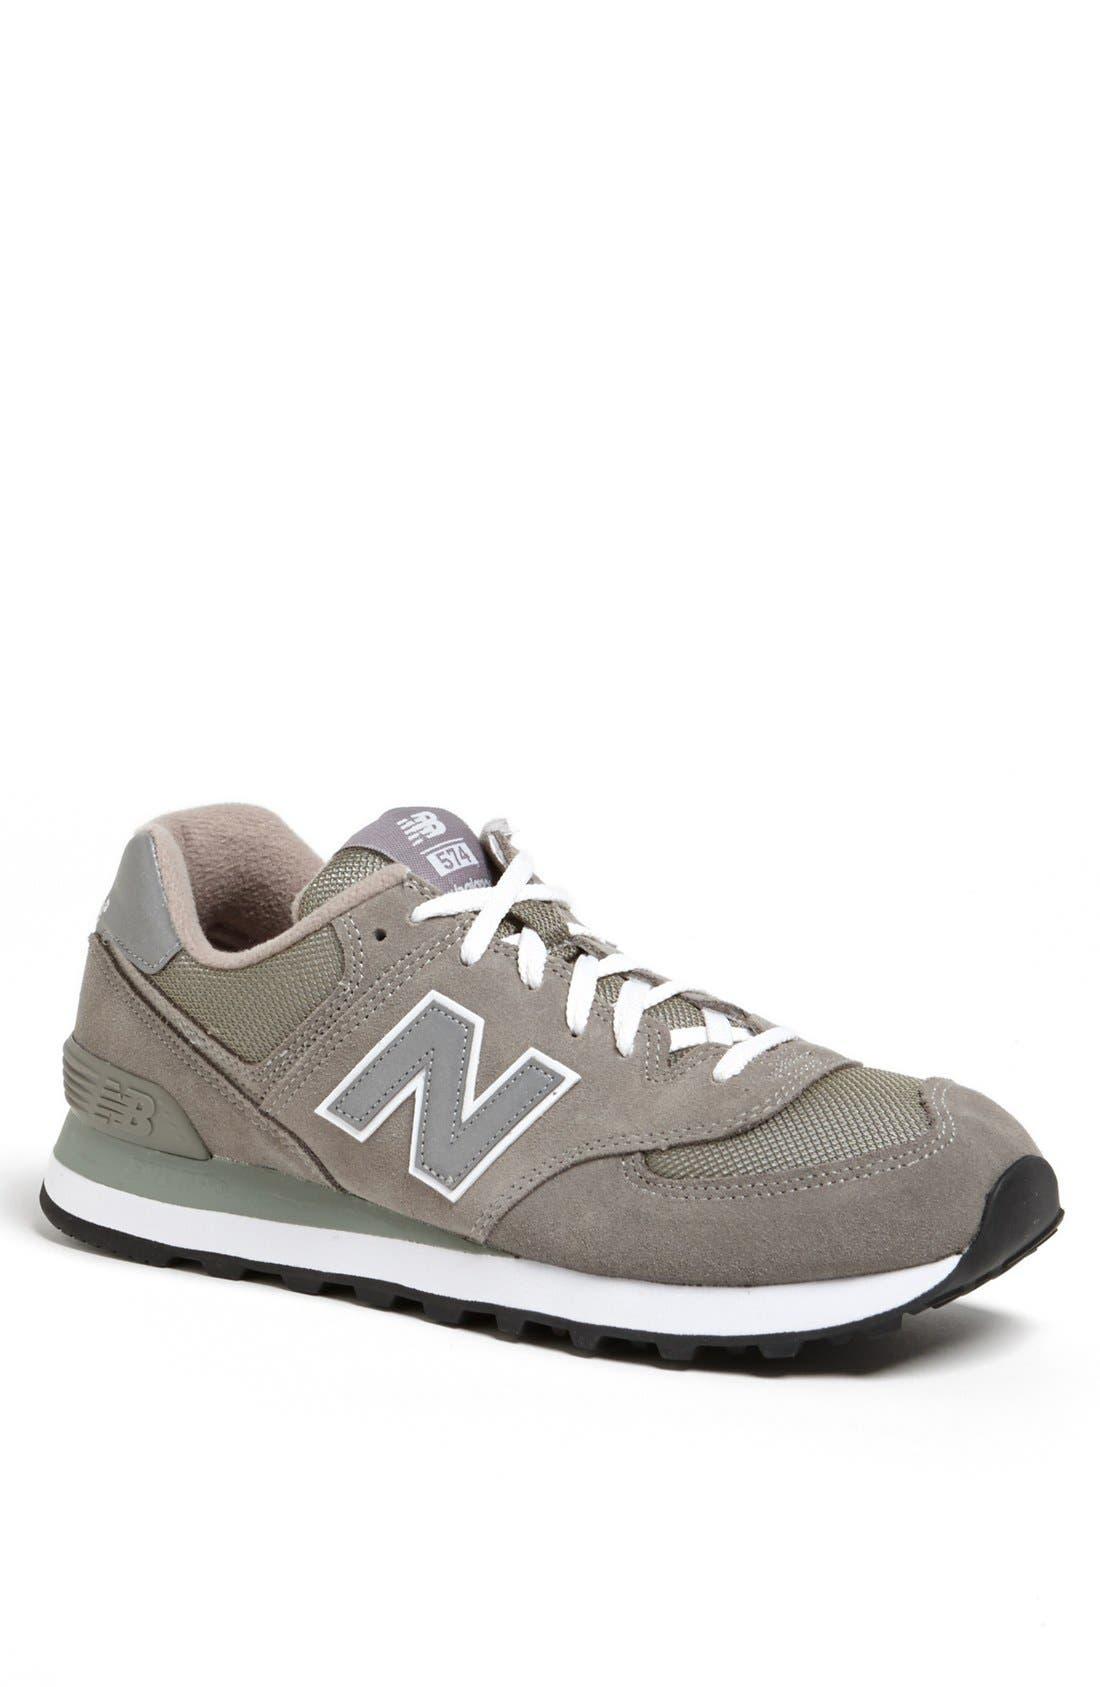 Main Image - New Balance '574' Sneaker (Men)